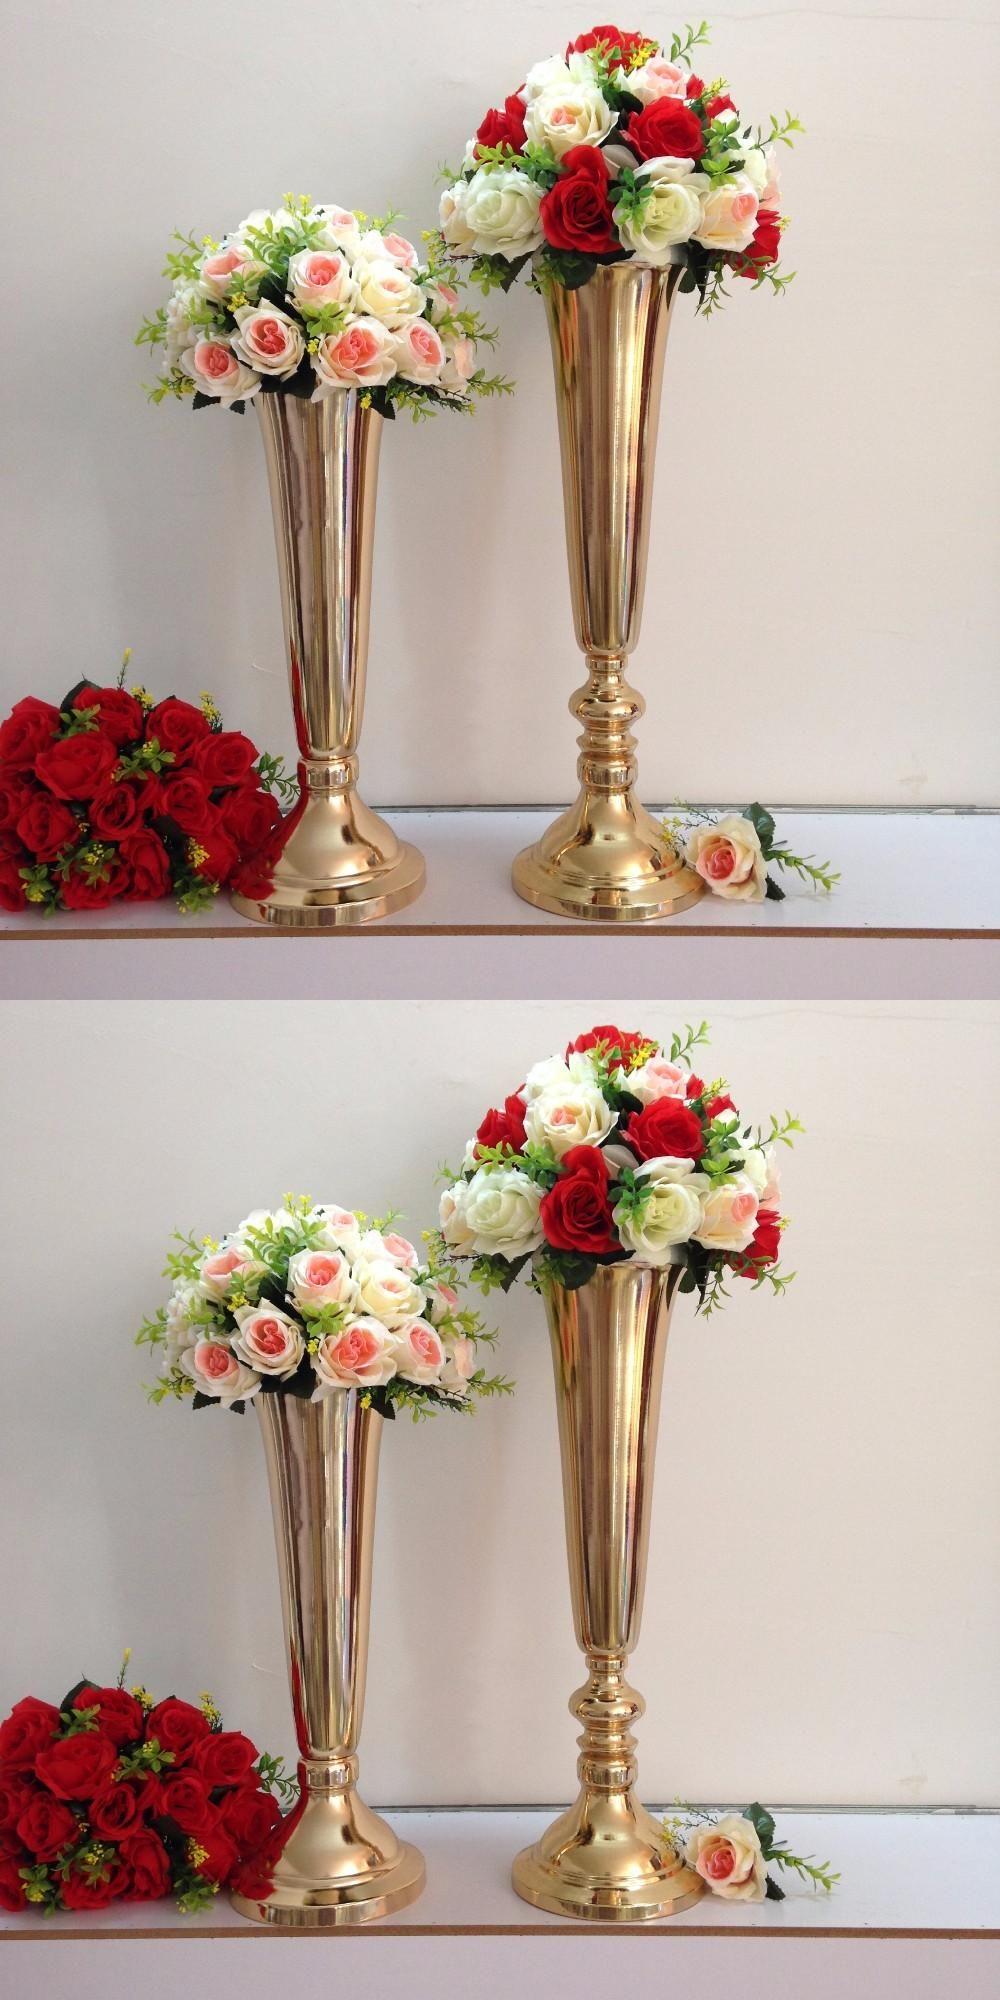 2017 wedding centerpiece table decoration flower vase display 2017 wedding centerpiece table decoration flower vase display wedding party favors home furnishing flower stand 60cm reviewsmspy